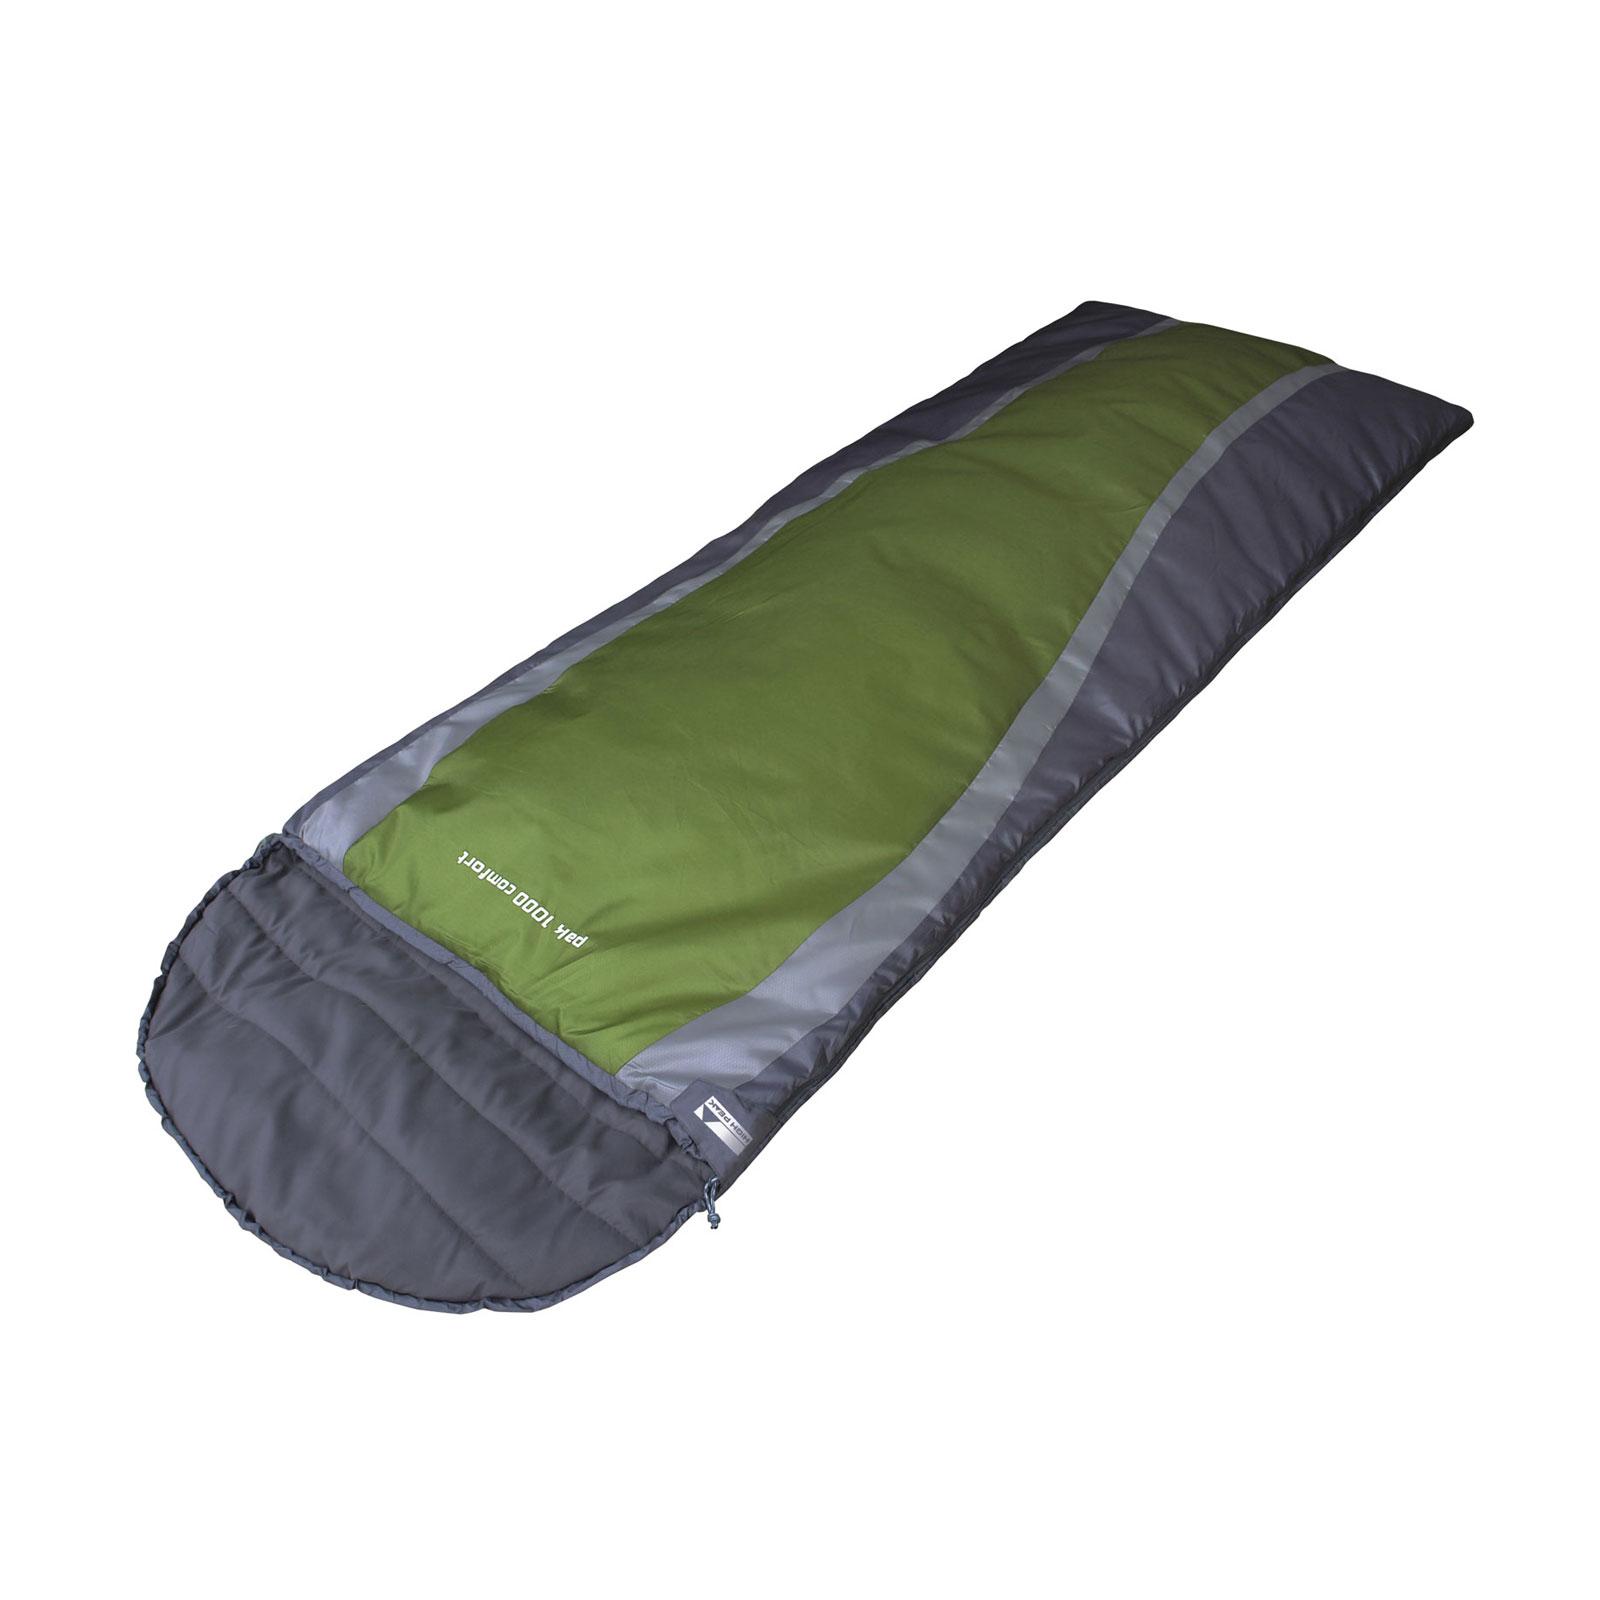 schlafsack high peak pak 1000 comfort deckenschlafsack. Black Bedroom Furniture Sets. Home Design Ideas